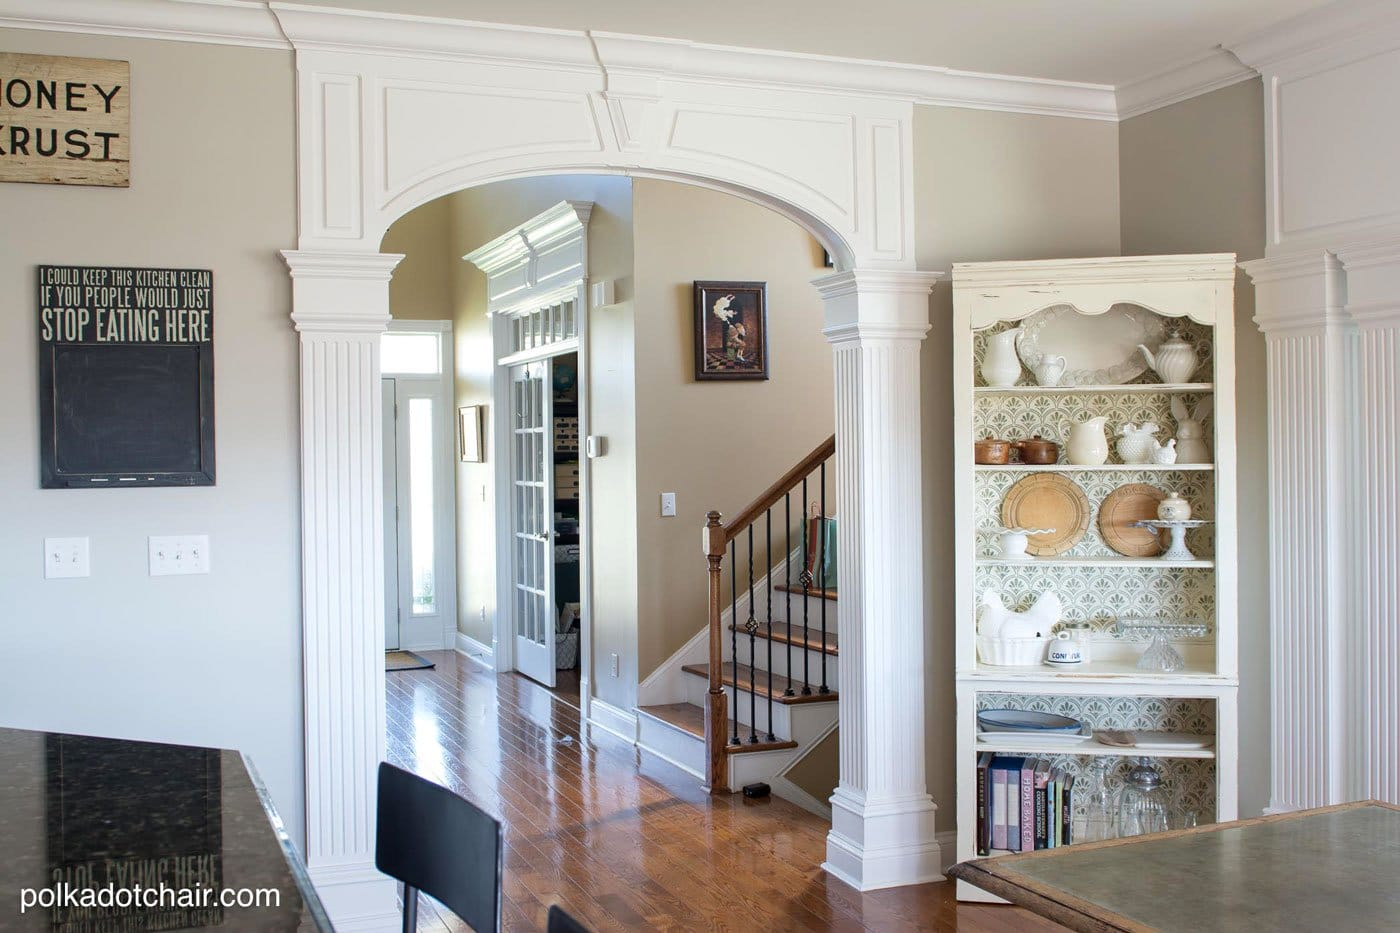 Kitchen Redo, White Painted Cabinets, Gray Island and Green Glass Tile Backsplash